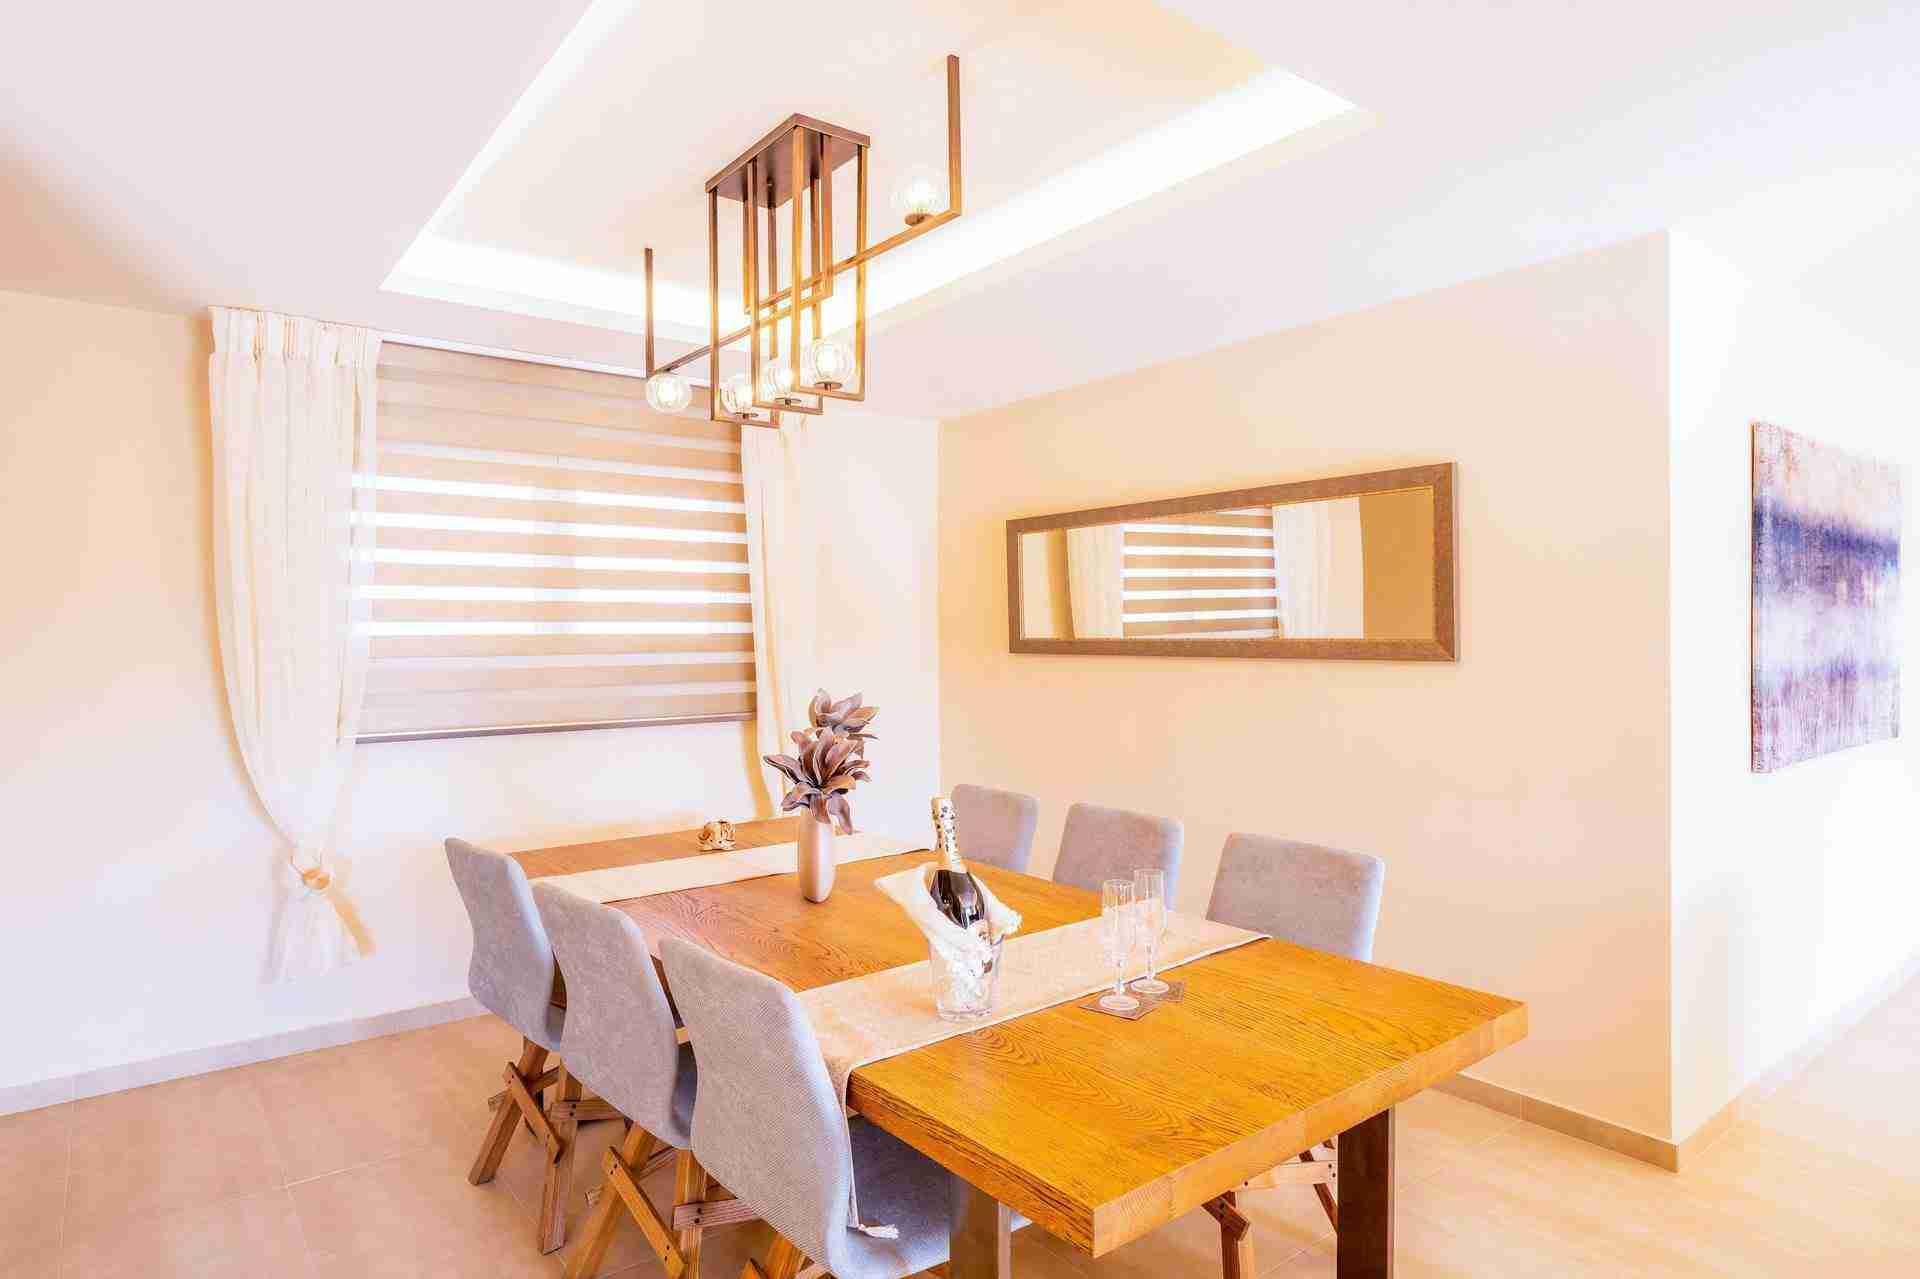 12 Petra dining room